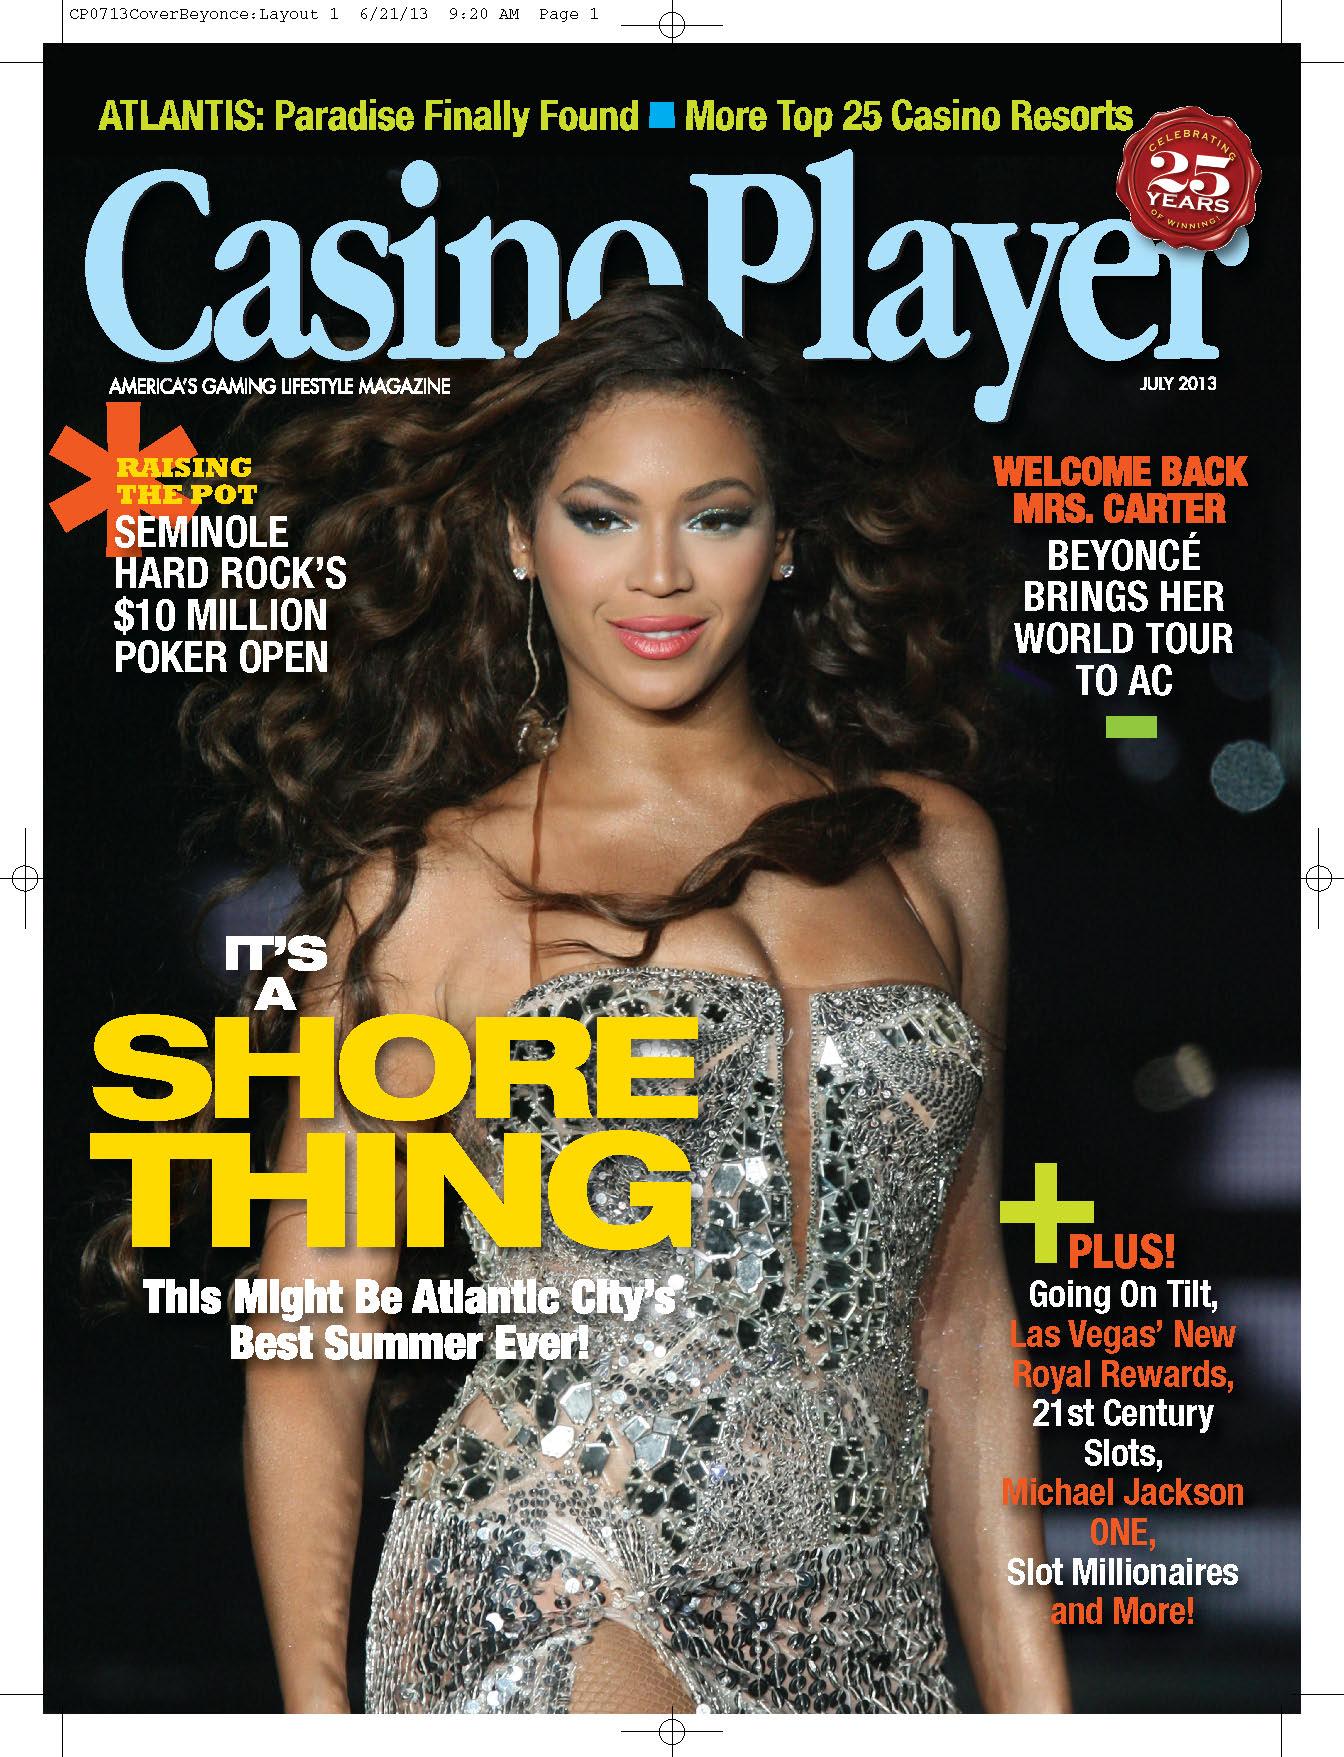 Las Vegas Backstage Talk column in Casino Player Magazine